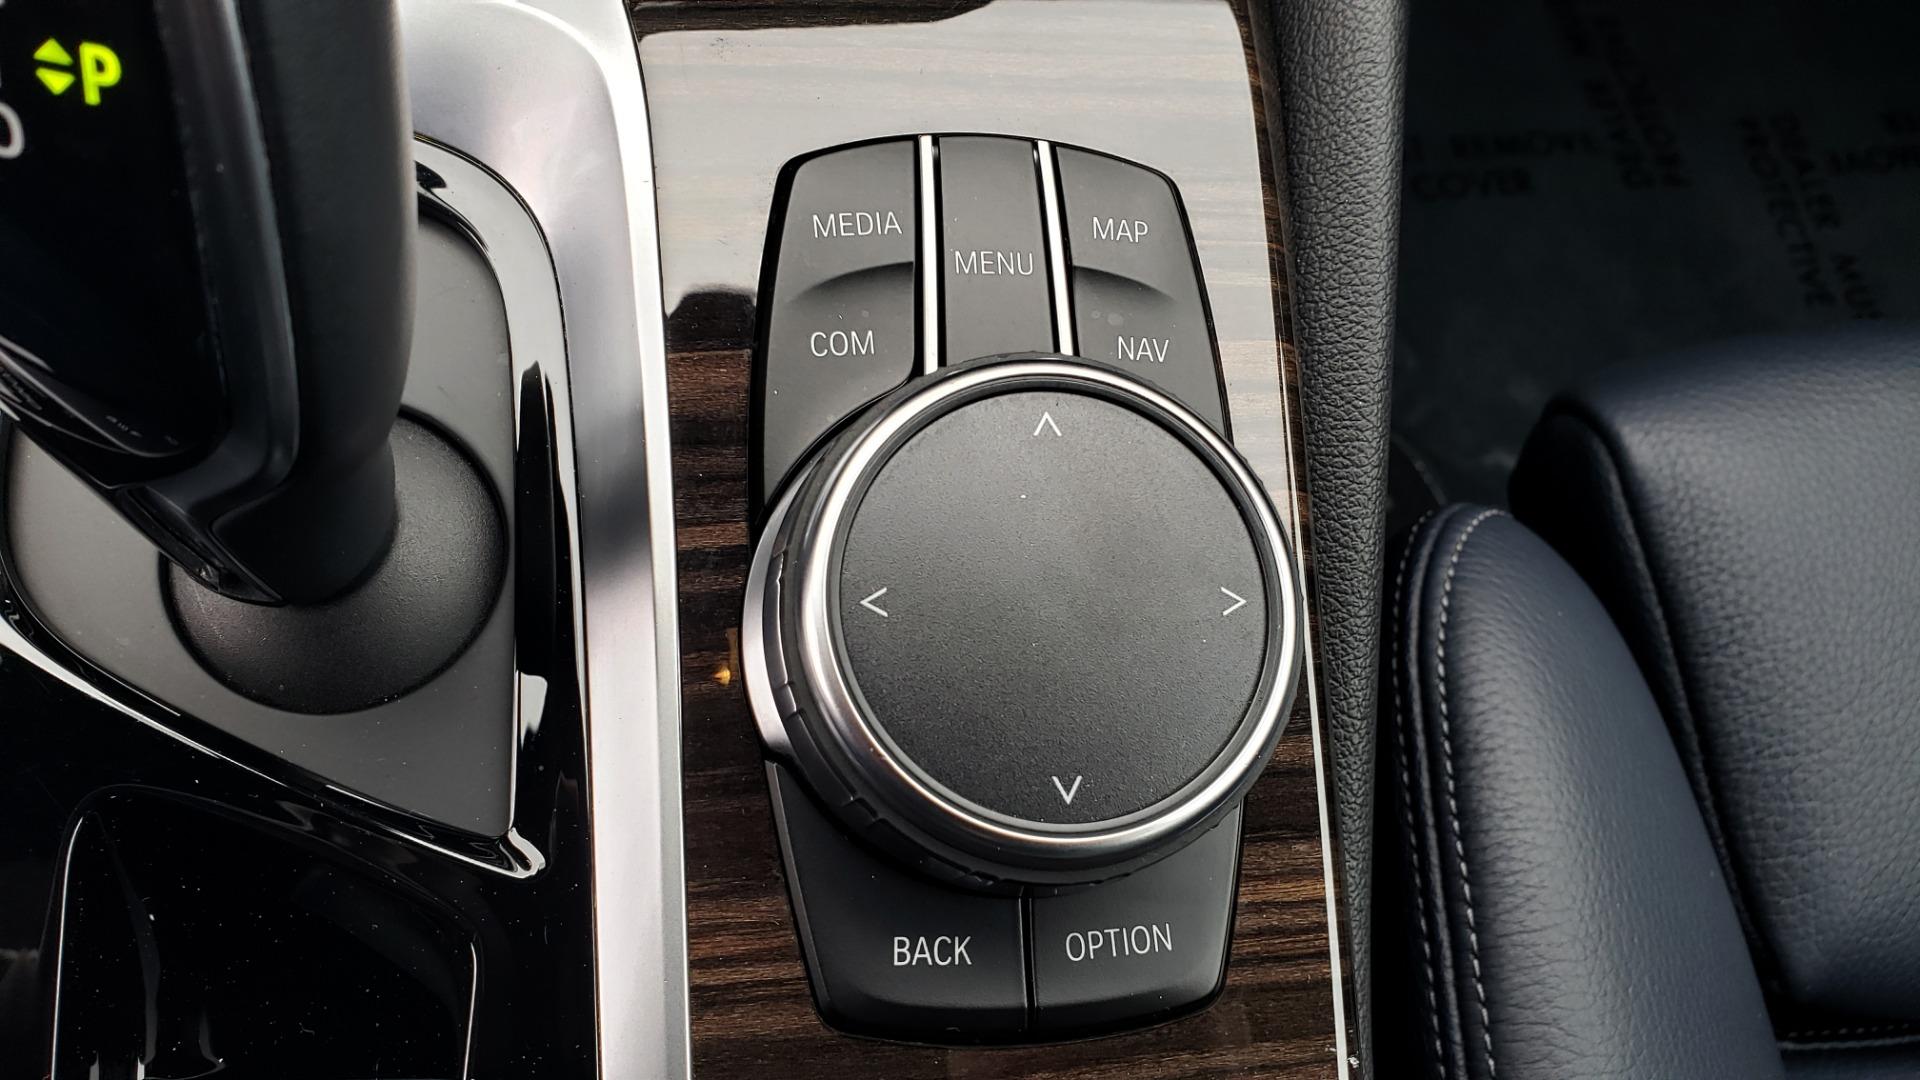 Used 2017 BMW 5 SERIES 530IXDRIVE / PREM PKG / DRVR ASST PLUS / CLD WTHR / APPLE CARPLAY for sale Sold at Formula Imports in Charlotte NC 28227 50